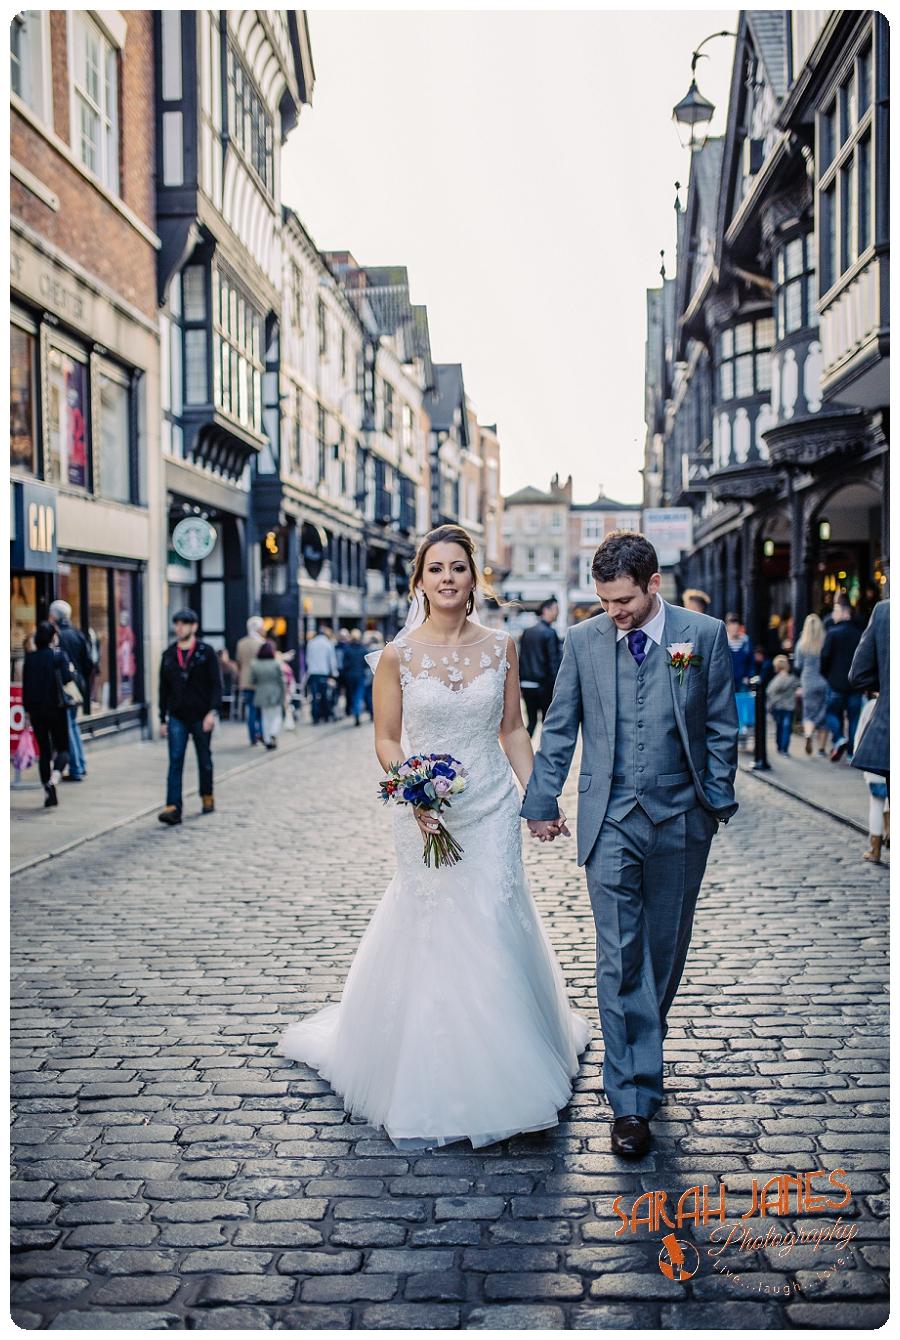 Wedding photography Chester, Weddings Rowton Hall, Wedding photography at Rowton Hall, Sarah Janes Photograpphy_0031.jpg